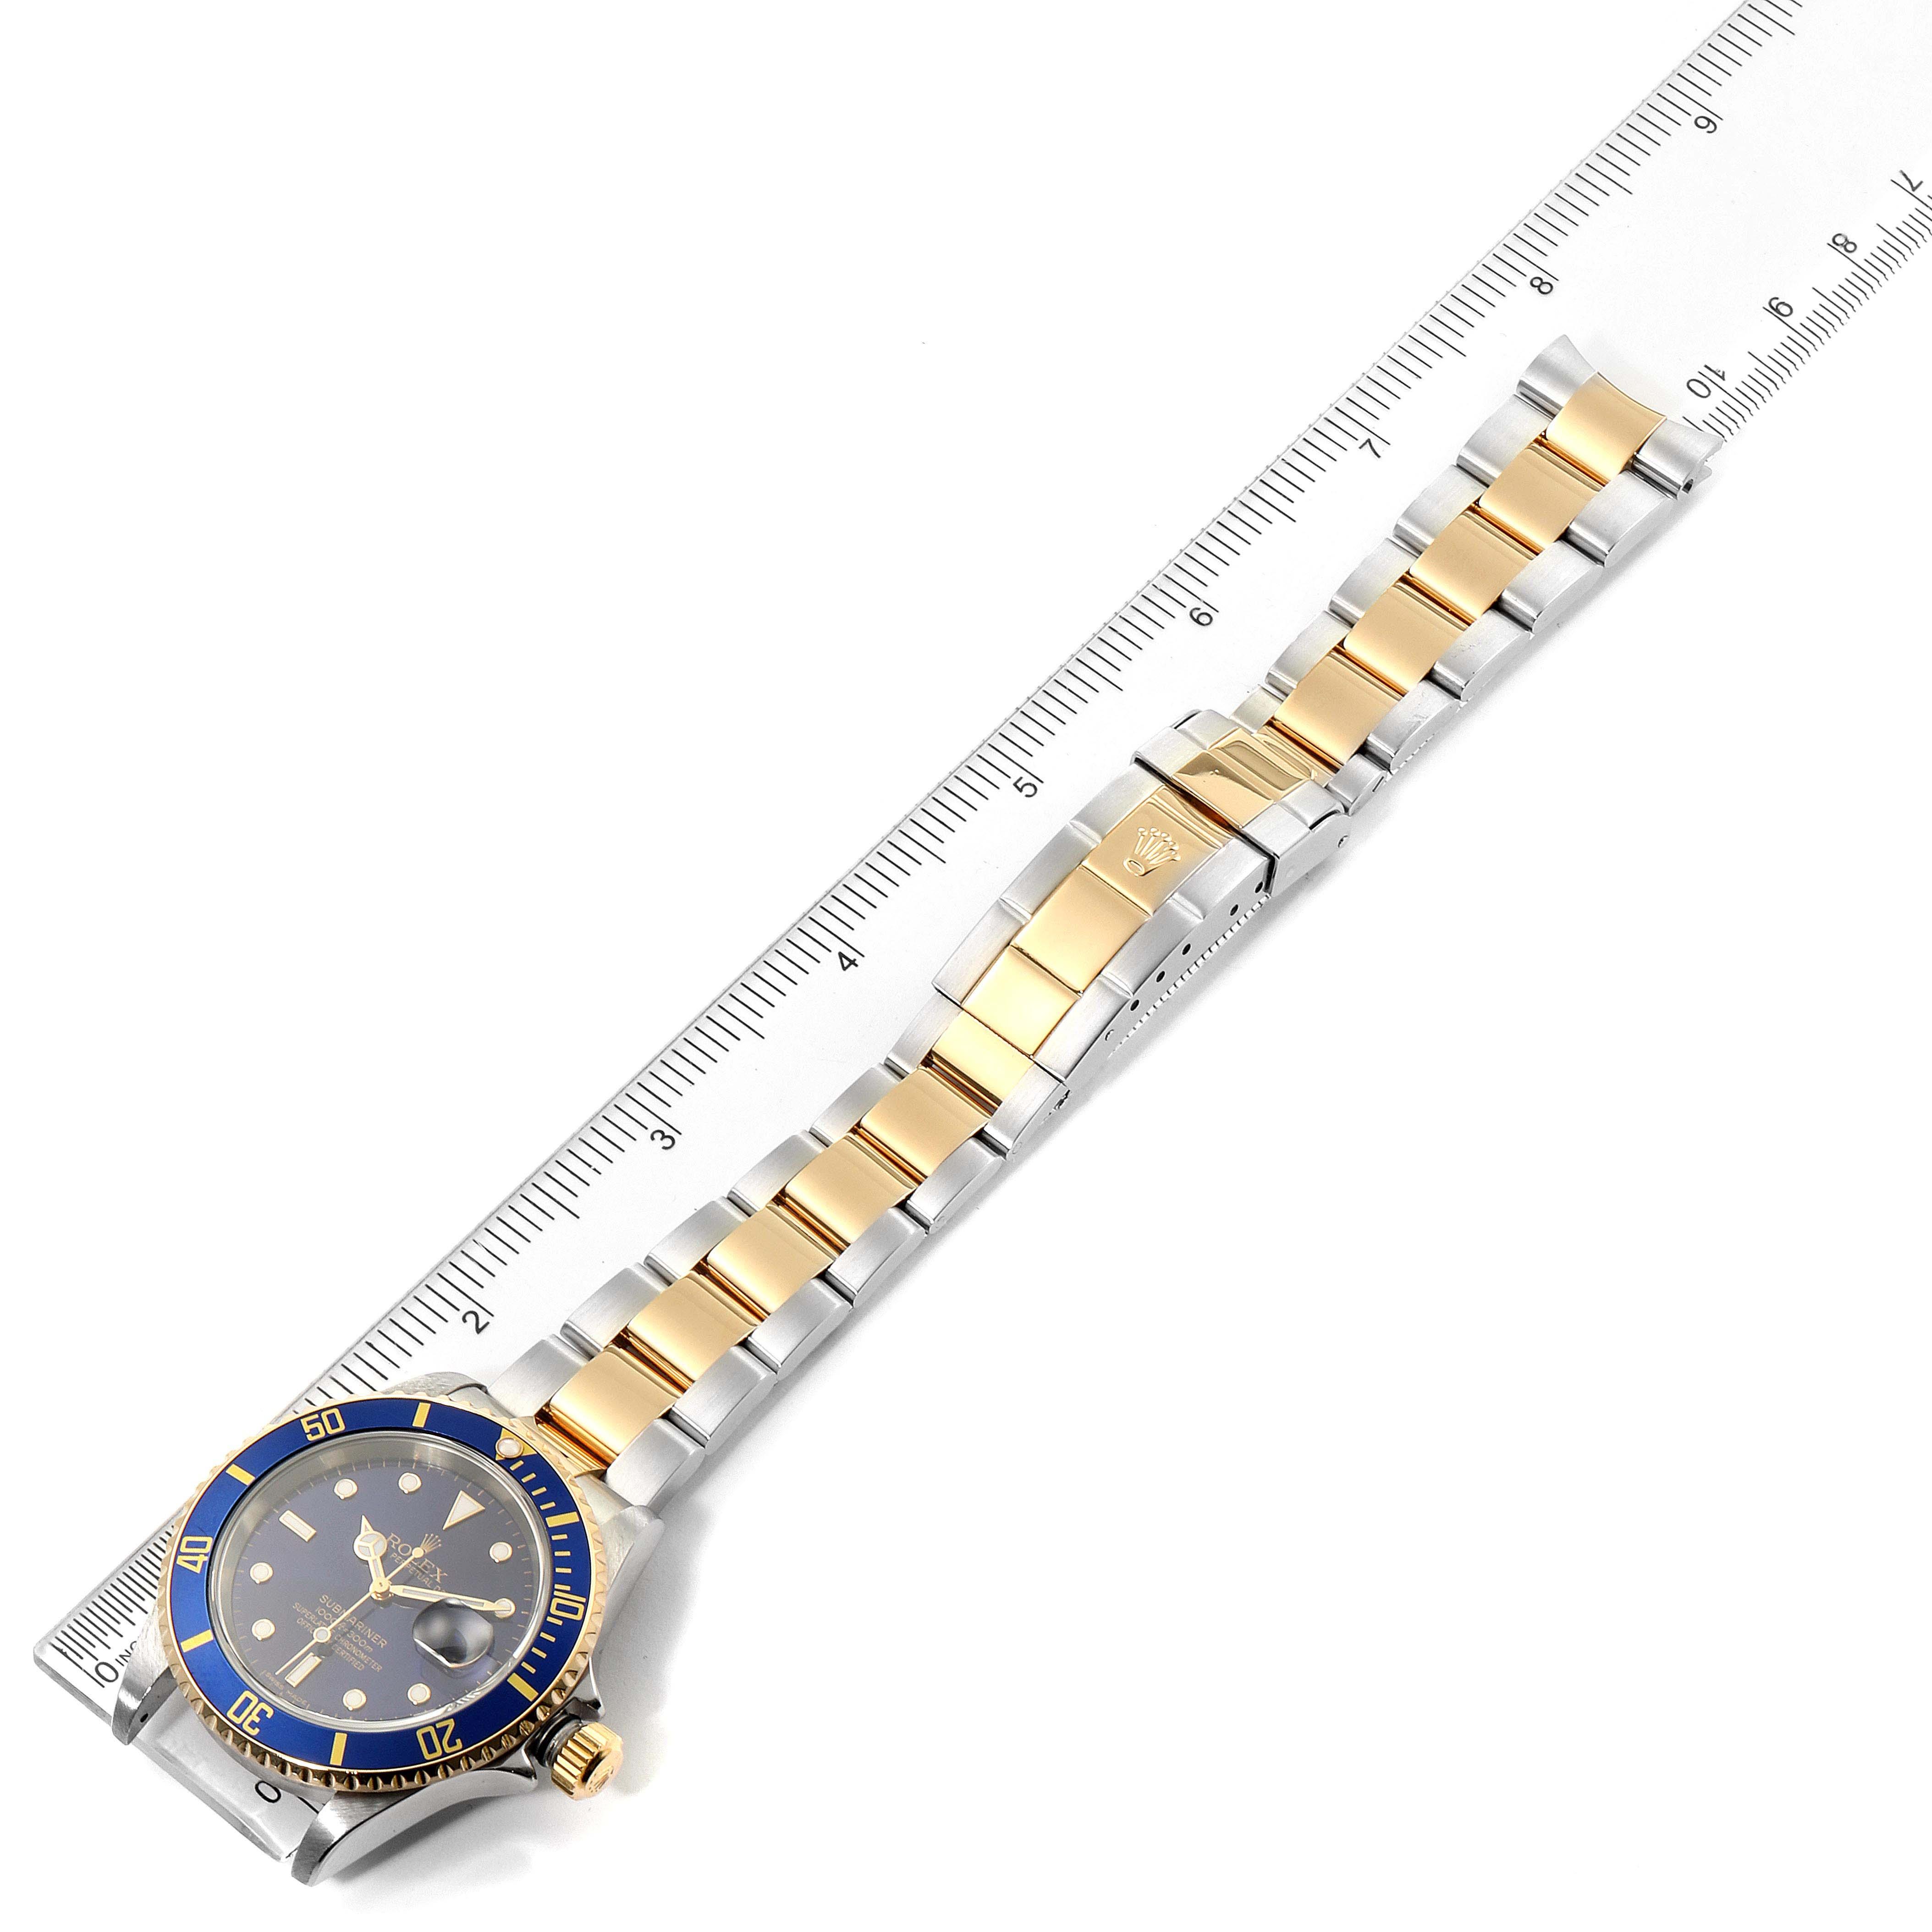 Rolex Submariner Blue Dial Steel Yellow Gold Mens Watch 16613 Box SwissWatchExpo